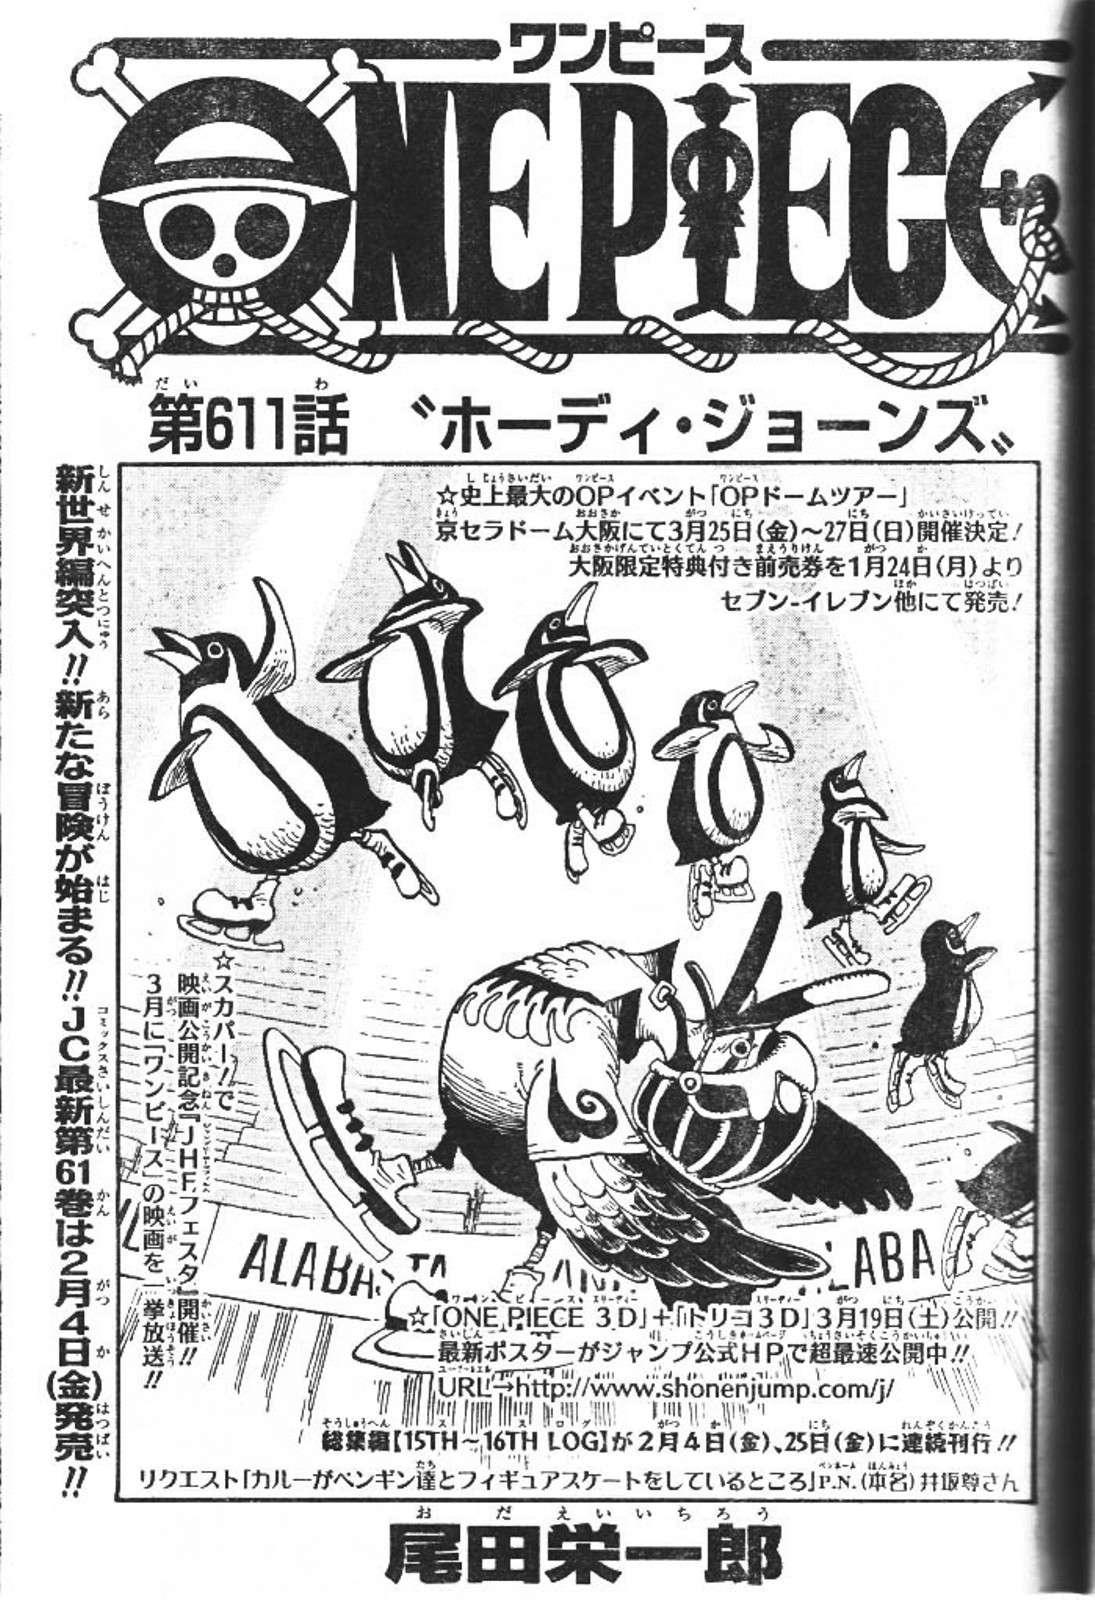 One Piece Manga 611 Spoiler Pics 01_raw10